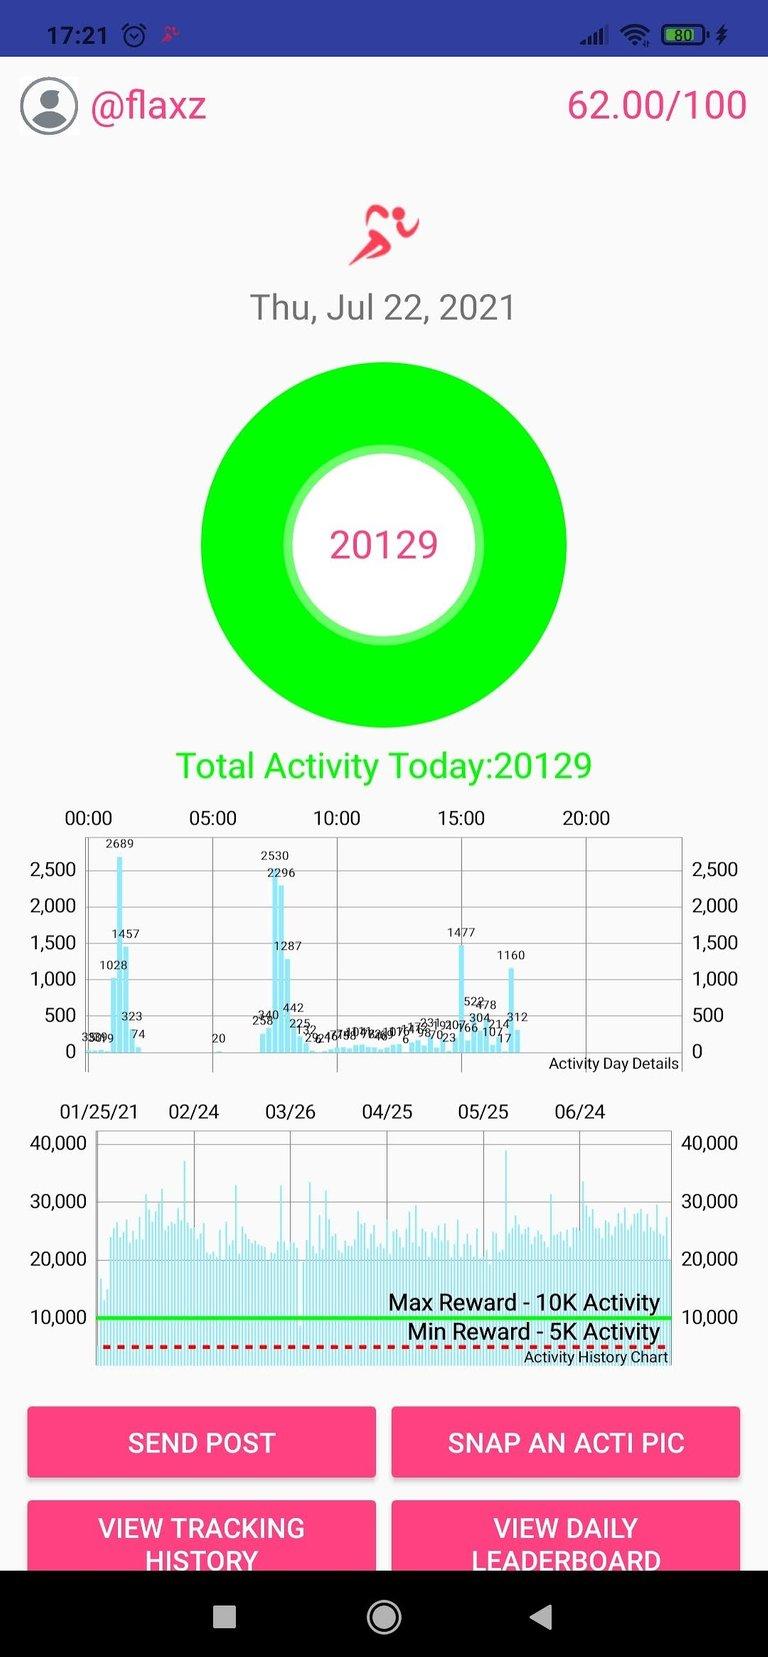 Screenshot_2021-07-22-17-21-48-005_io.actifit.fitnesstracker.actifitfitnesstracker.jpg